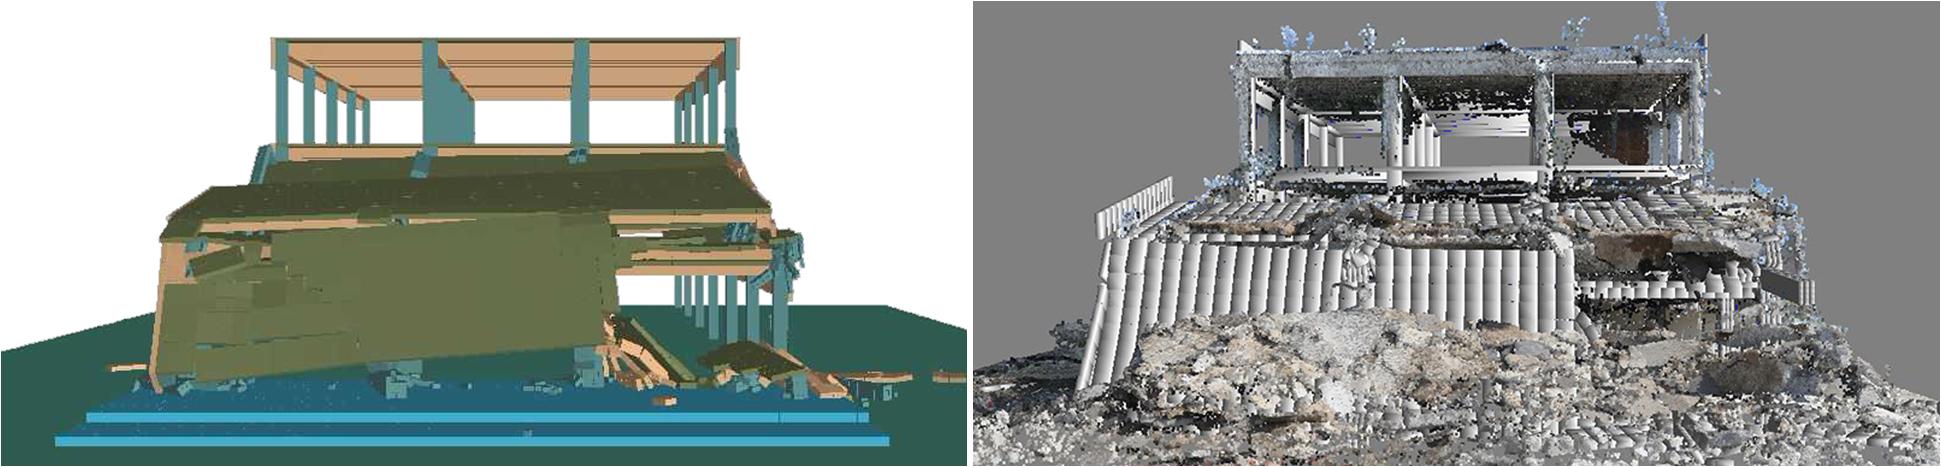 ELS Results Compaired to 3D Laser Scan of Site After Demolition